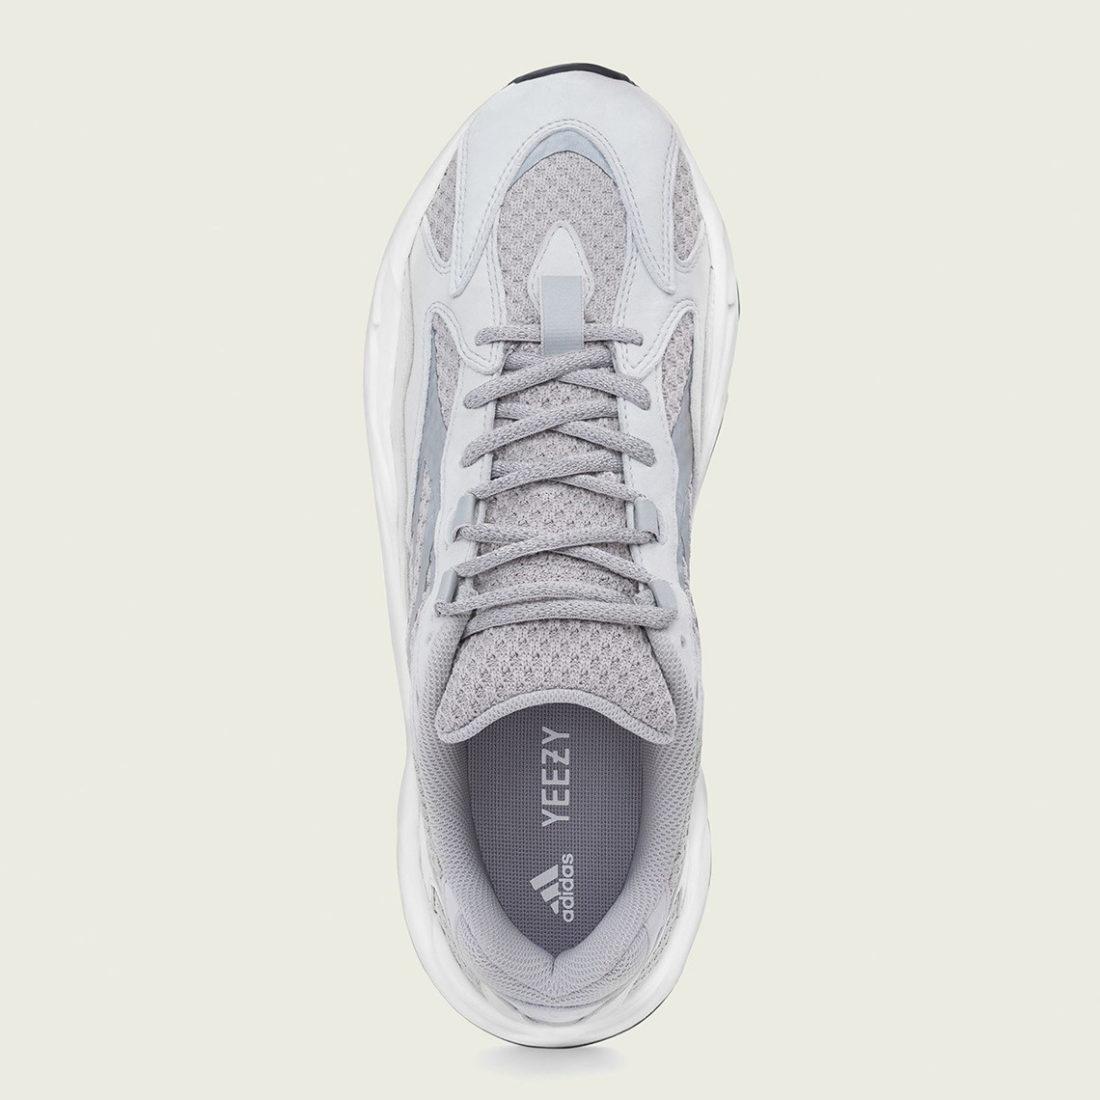 adidas yeezy boost 700 blanche